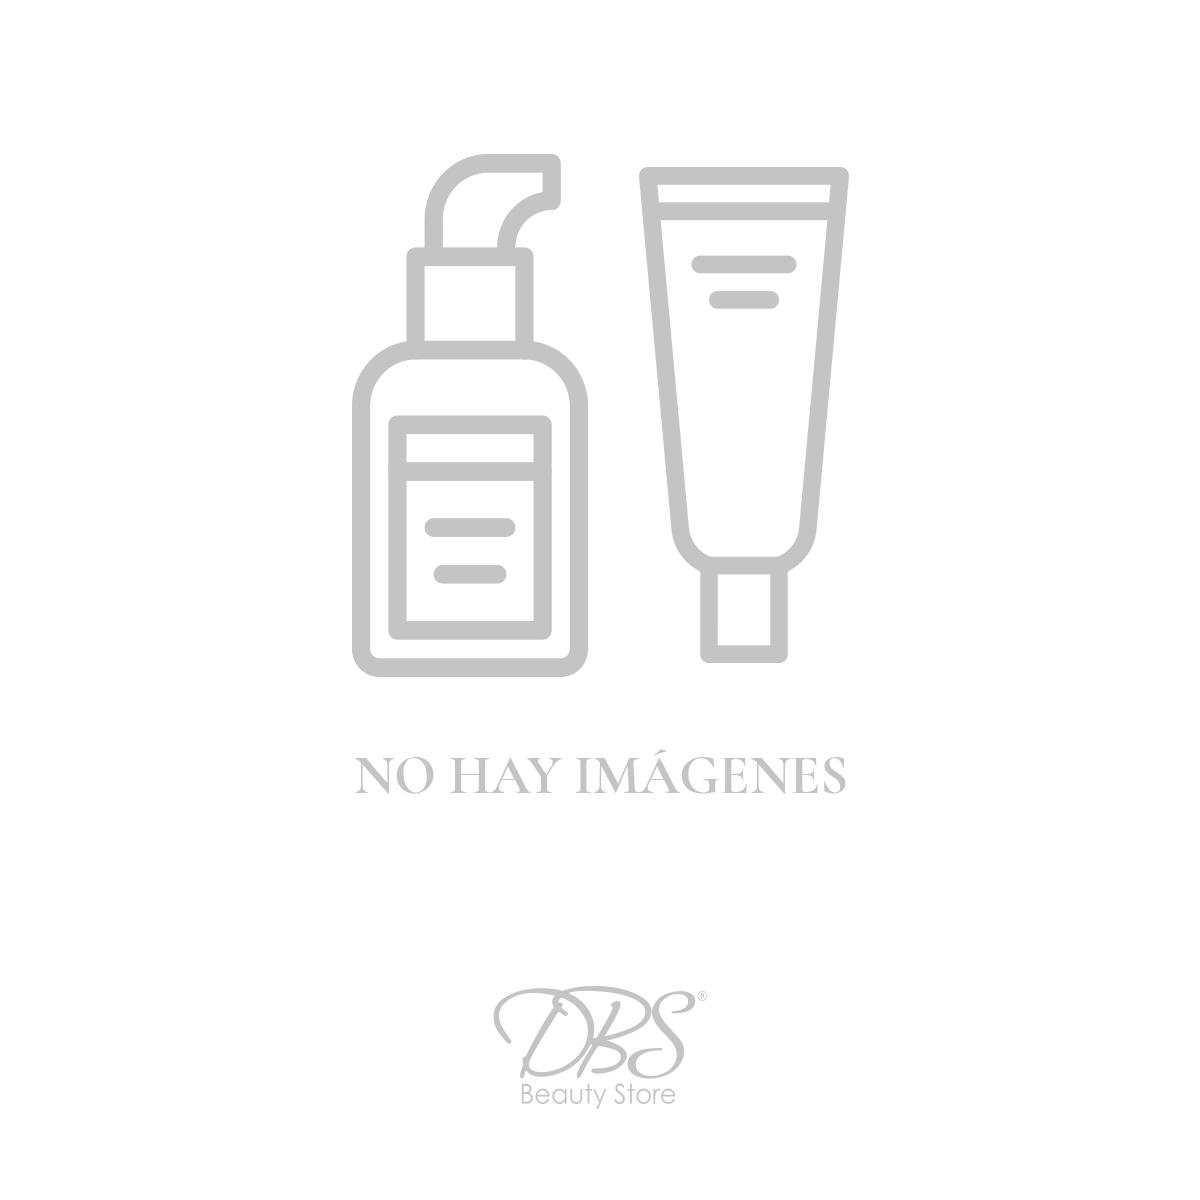 loreal-maquillaje-LO-35800.jpg